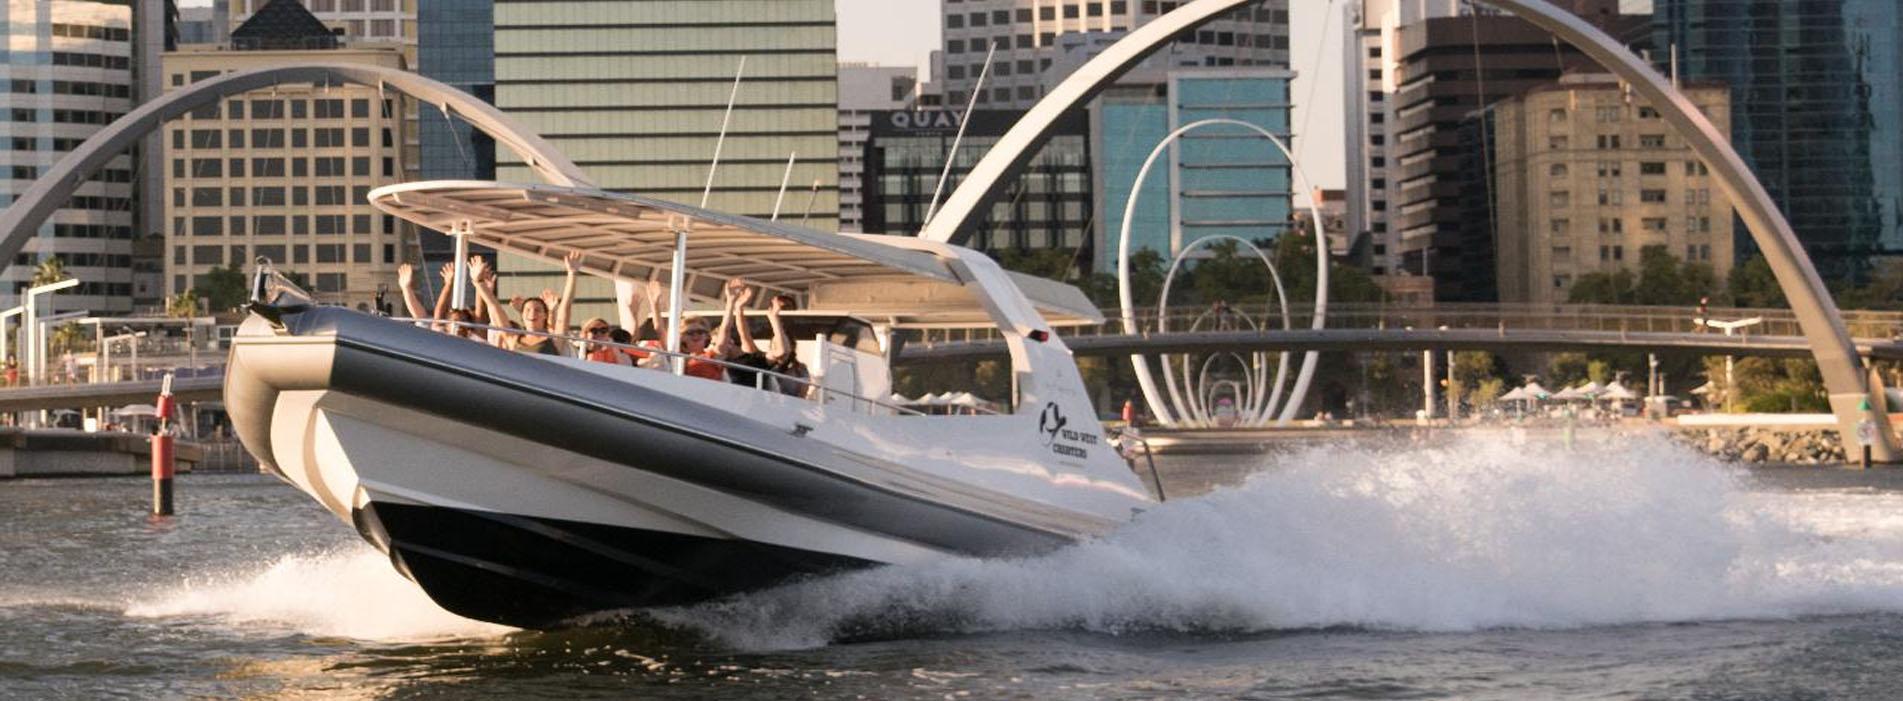 INFINITY Perth Swan River boat tour Kings Park Heirisson Island